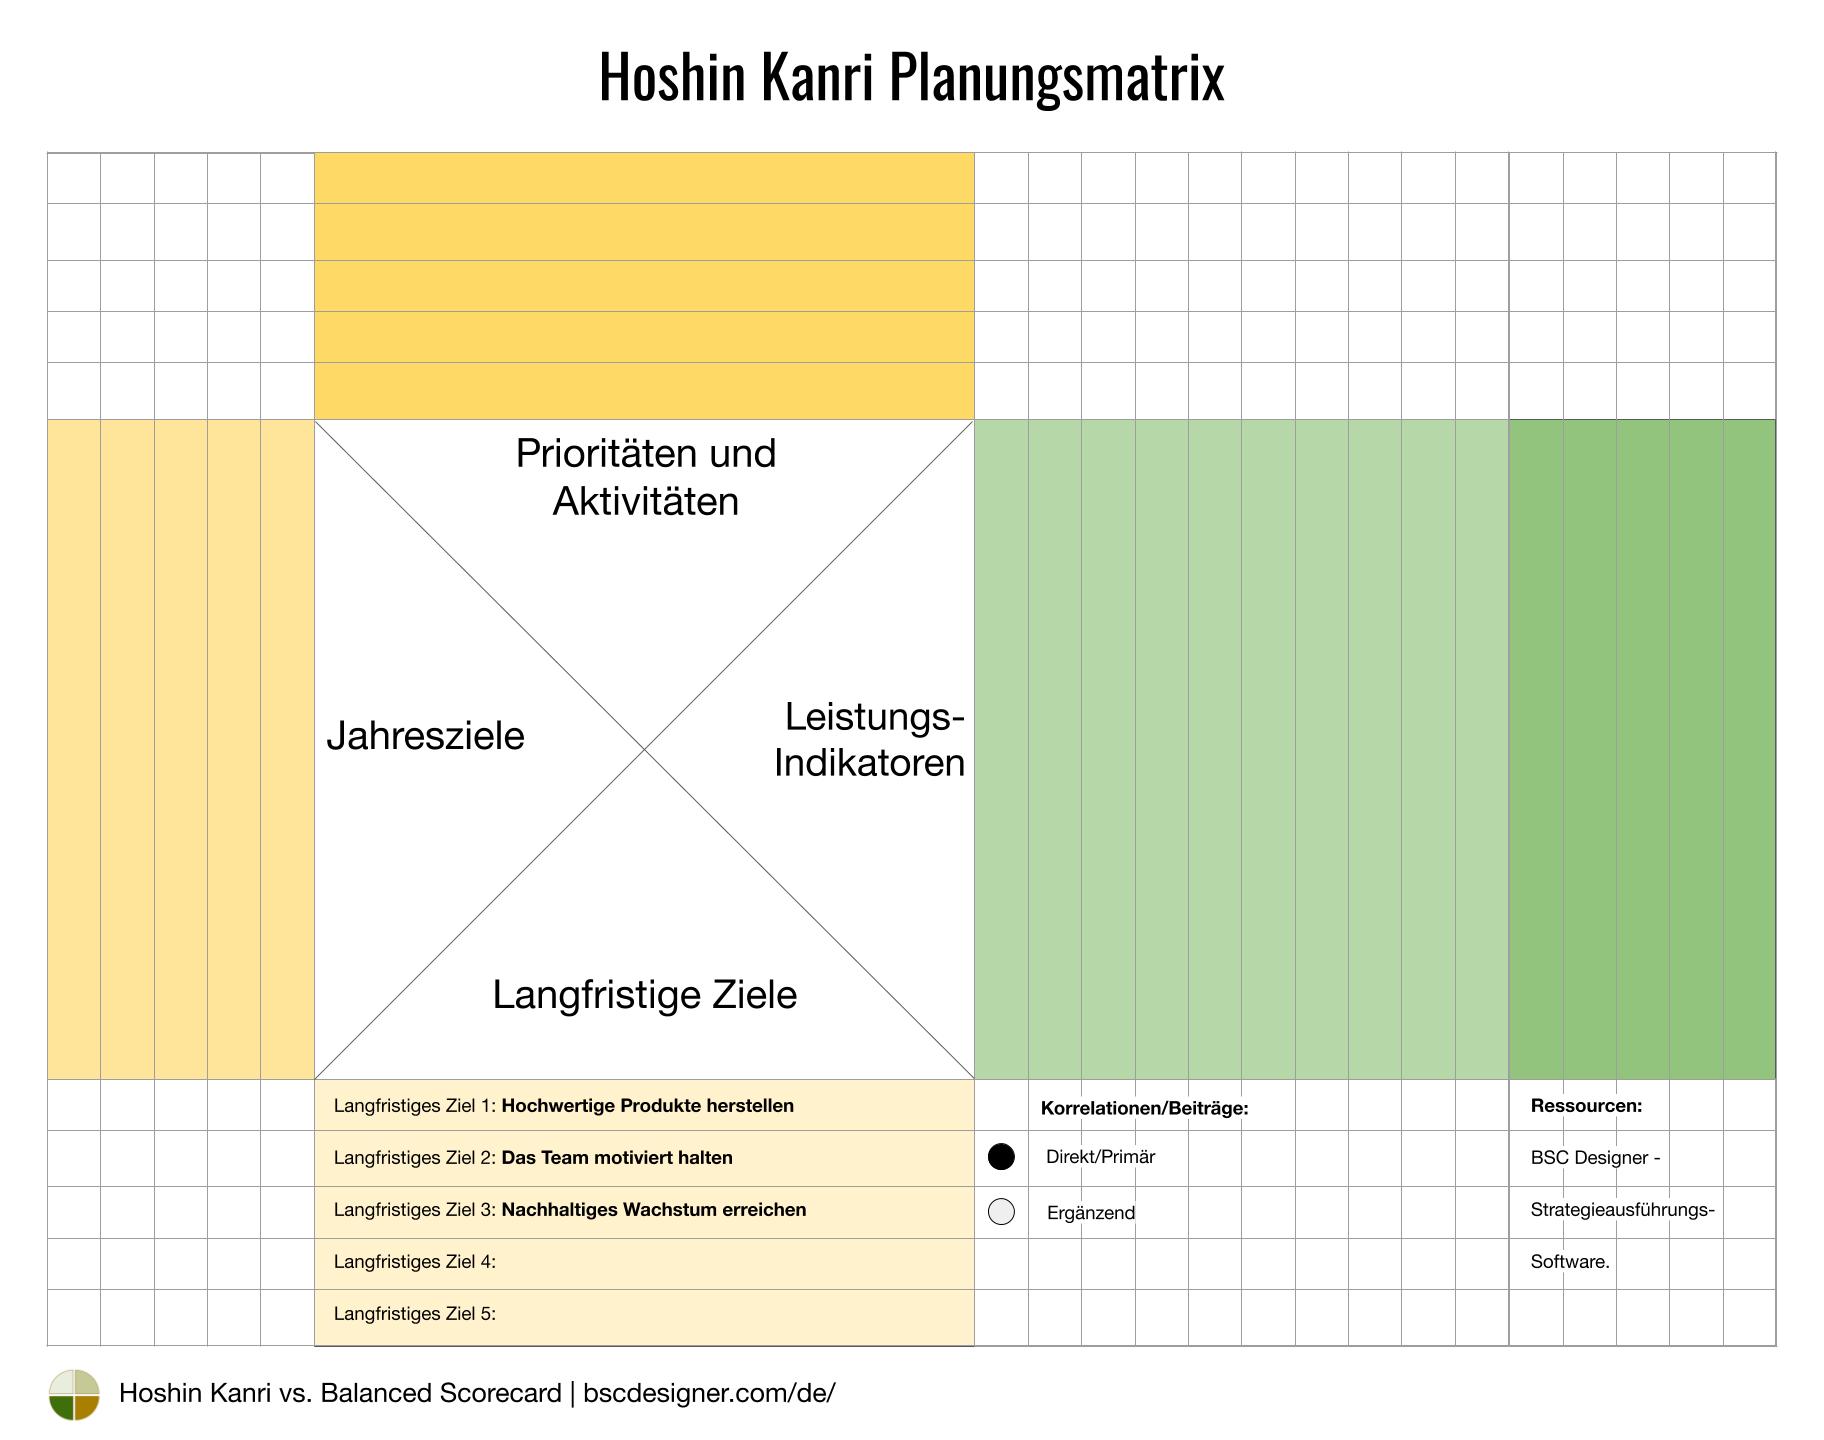 Hoshin Kanri Matrix - Langfristige Ziele